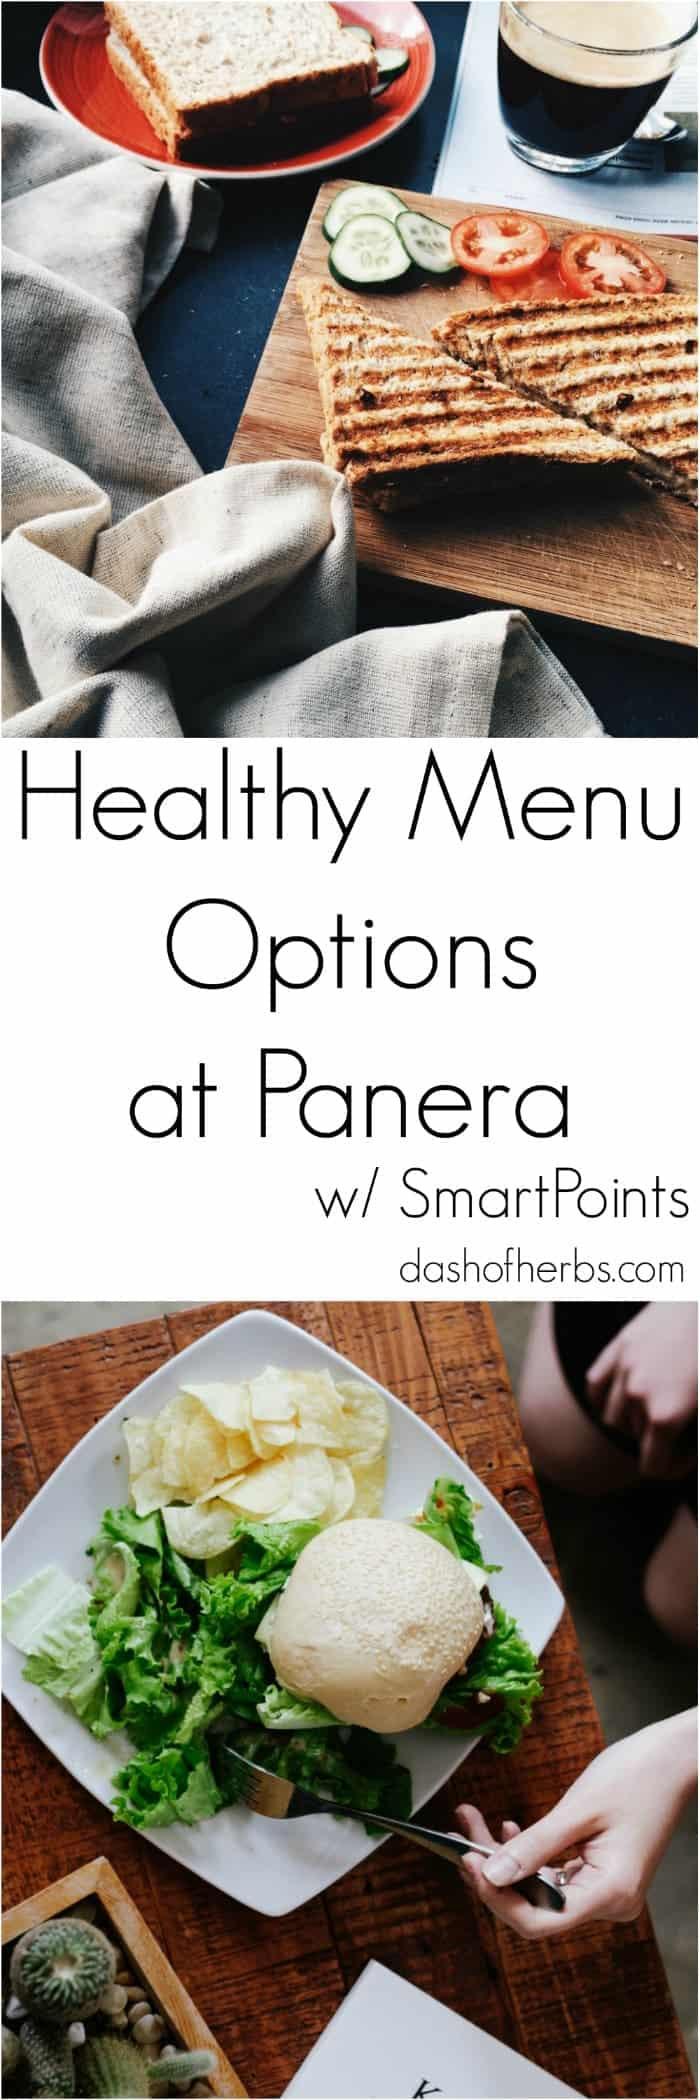 Healthy Bread Options  Healthy Menu Options at Panera Bread Dash of Herbs